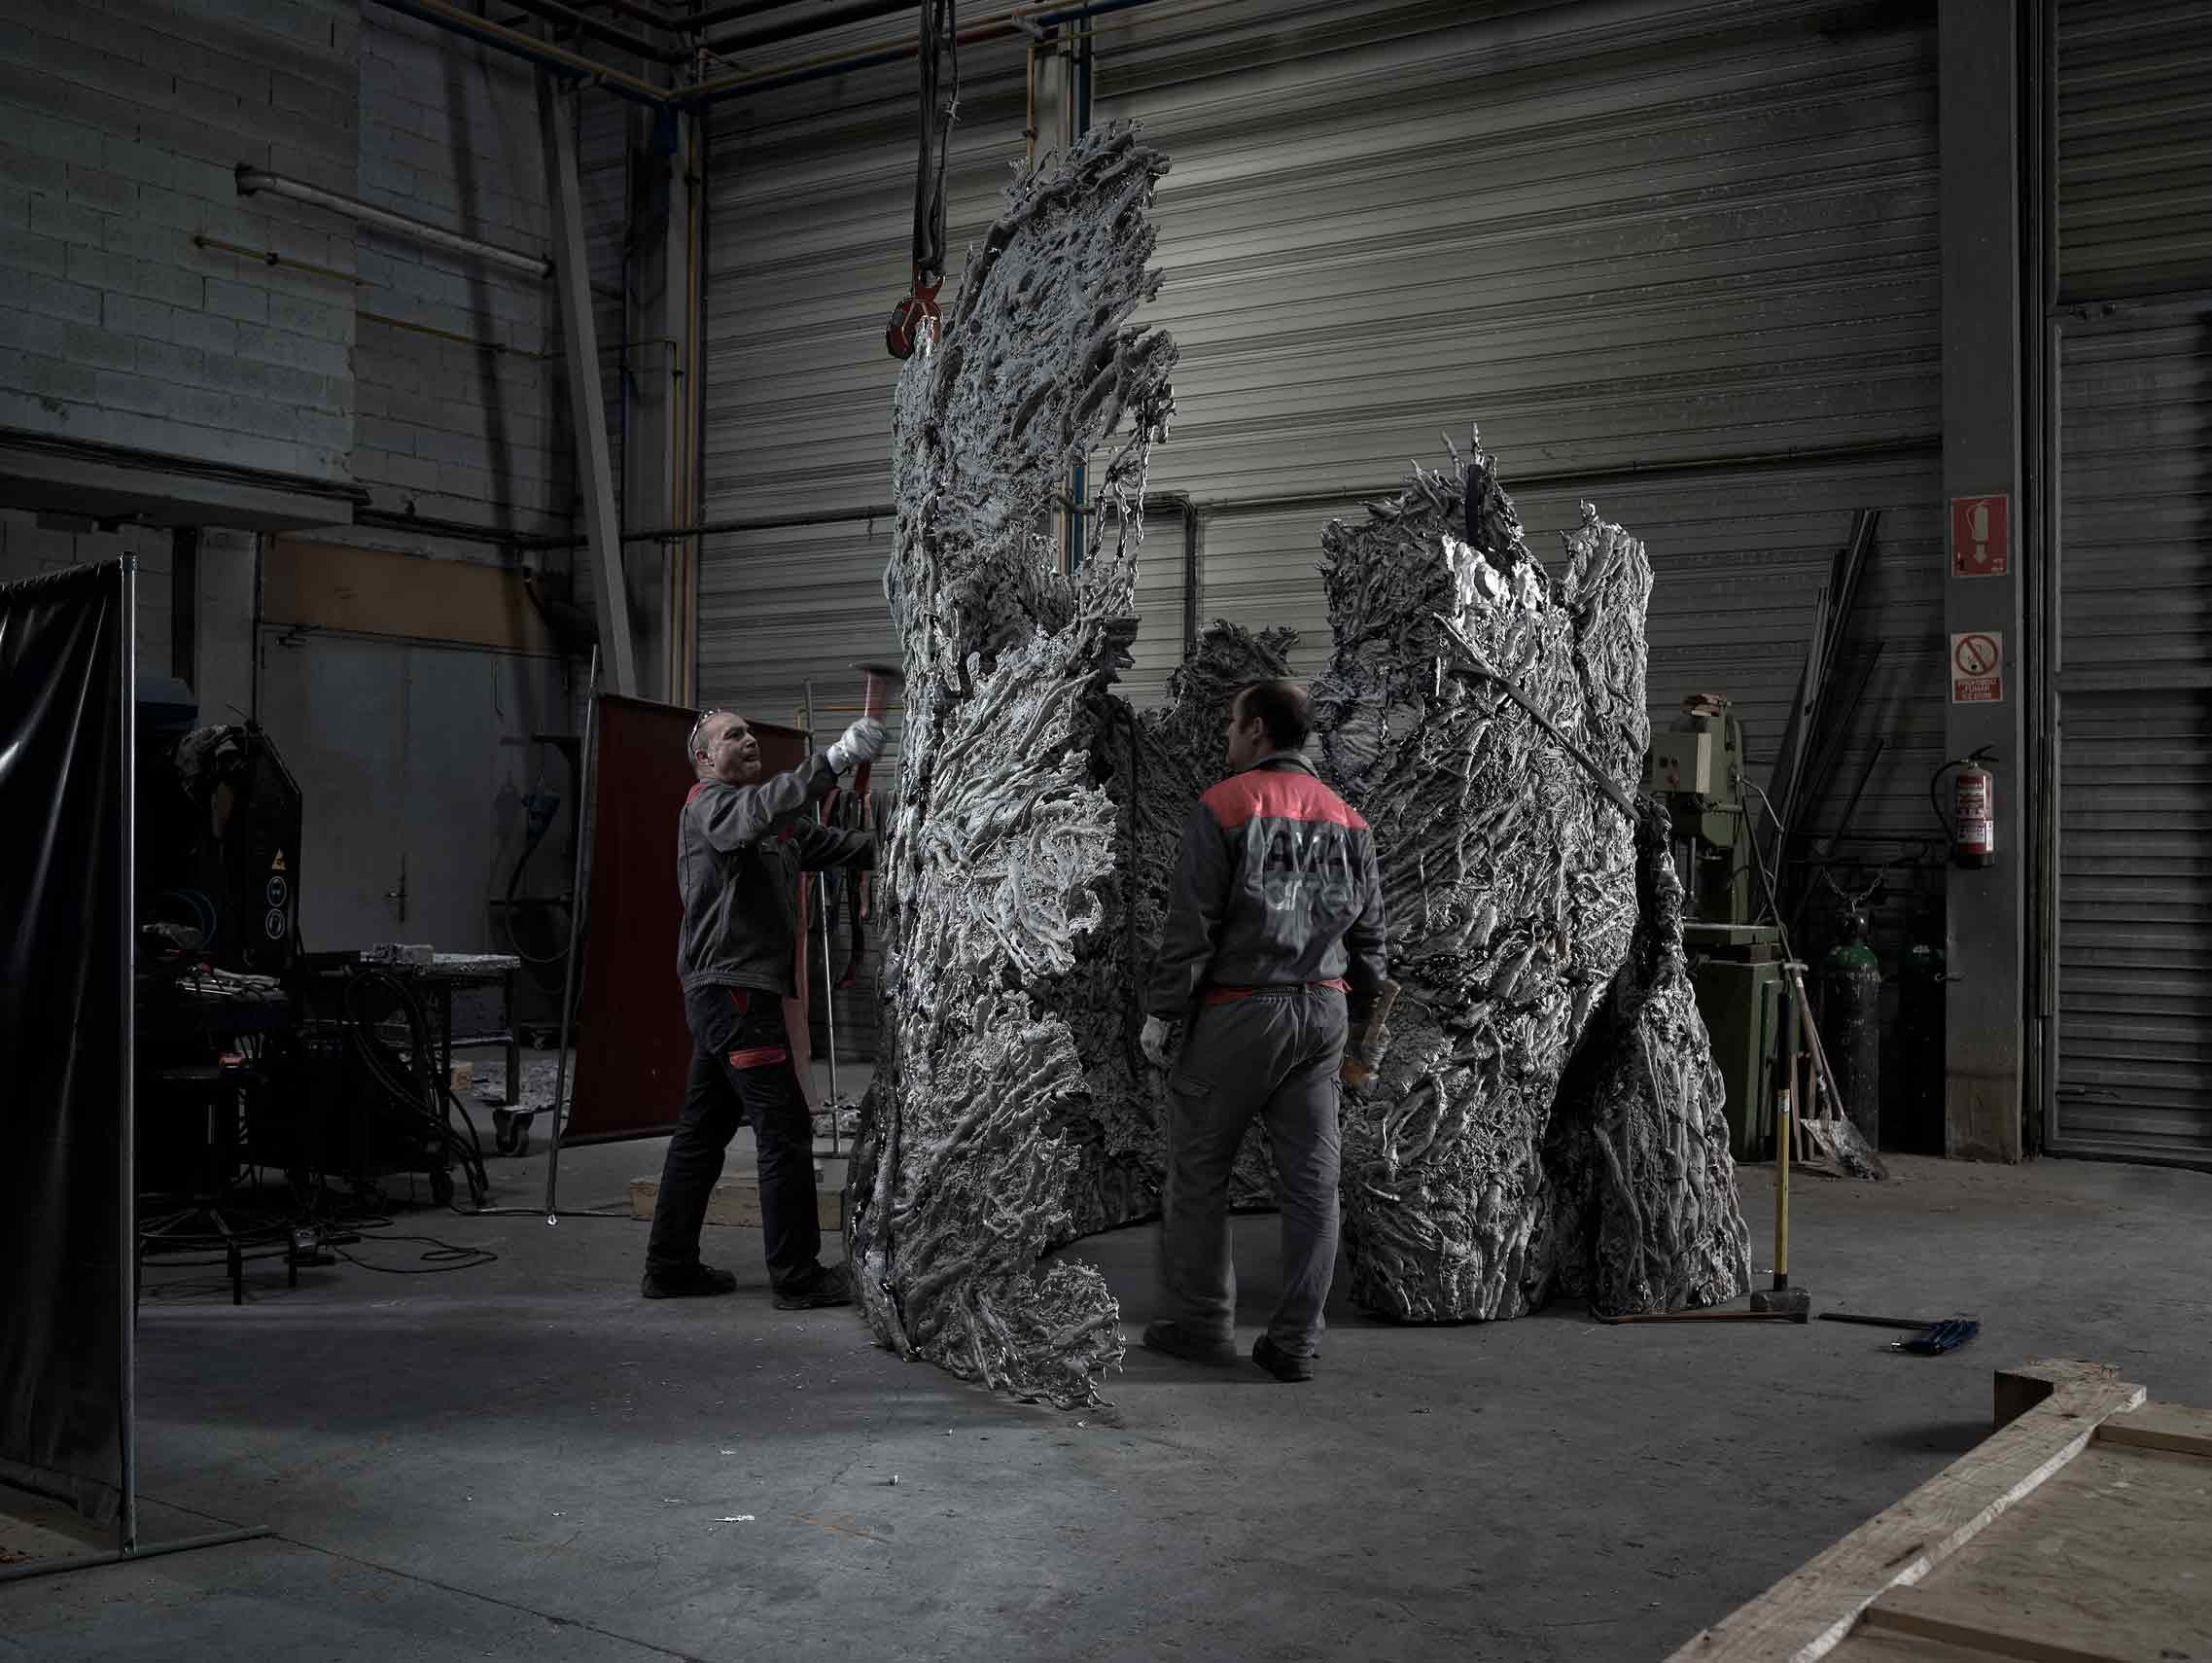 Sculpture GROWTH I, aluminum and glass, Cristina Iglesias, cast in Alfa Arte